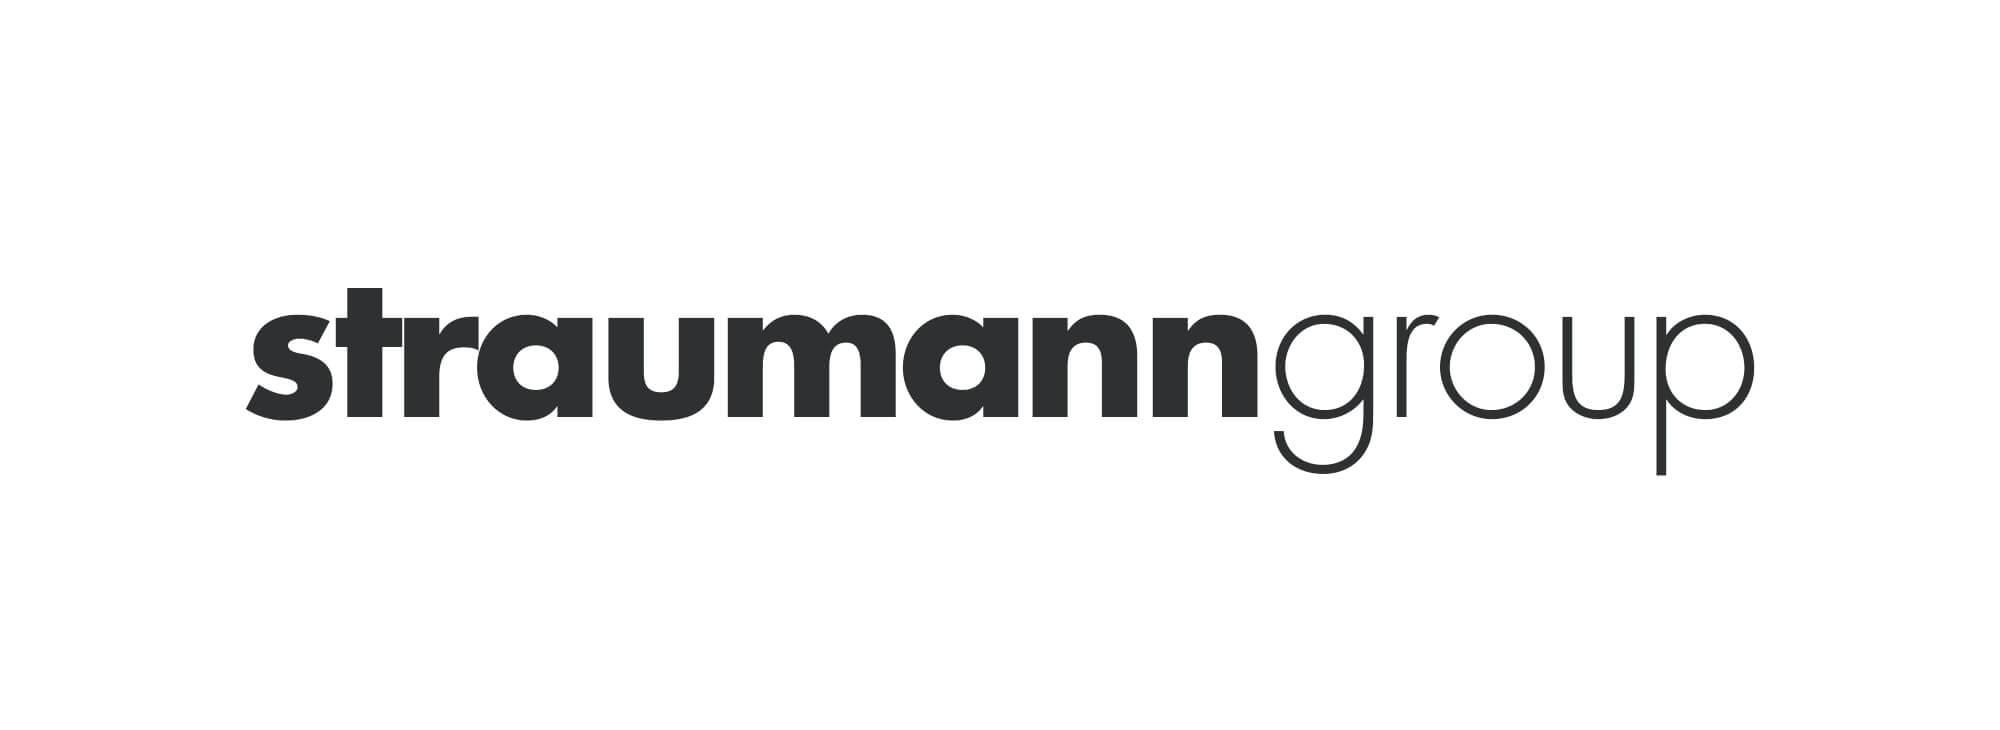 StraumannGroup Logo CMYK (2) (1)